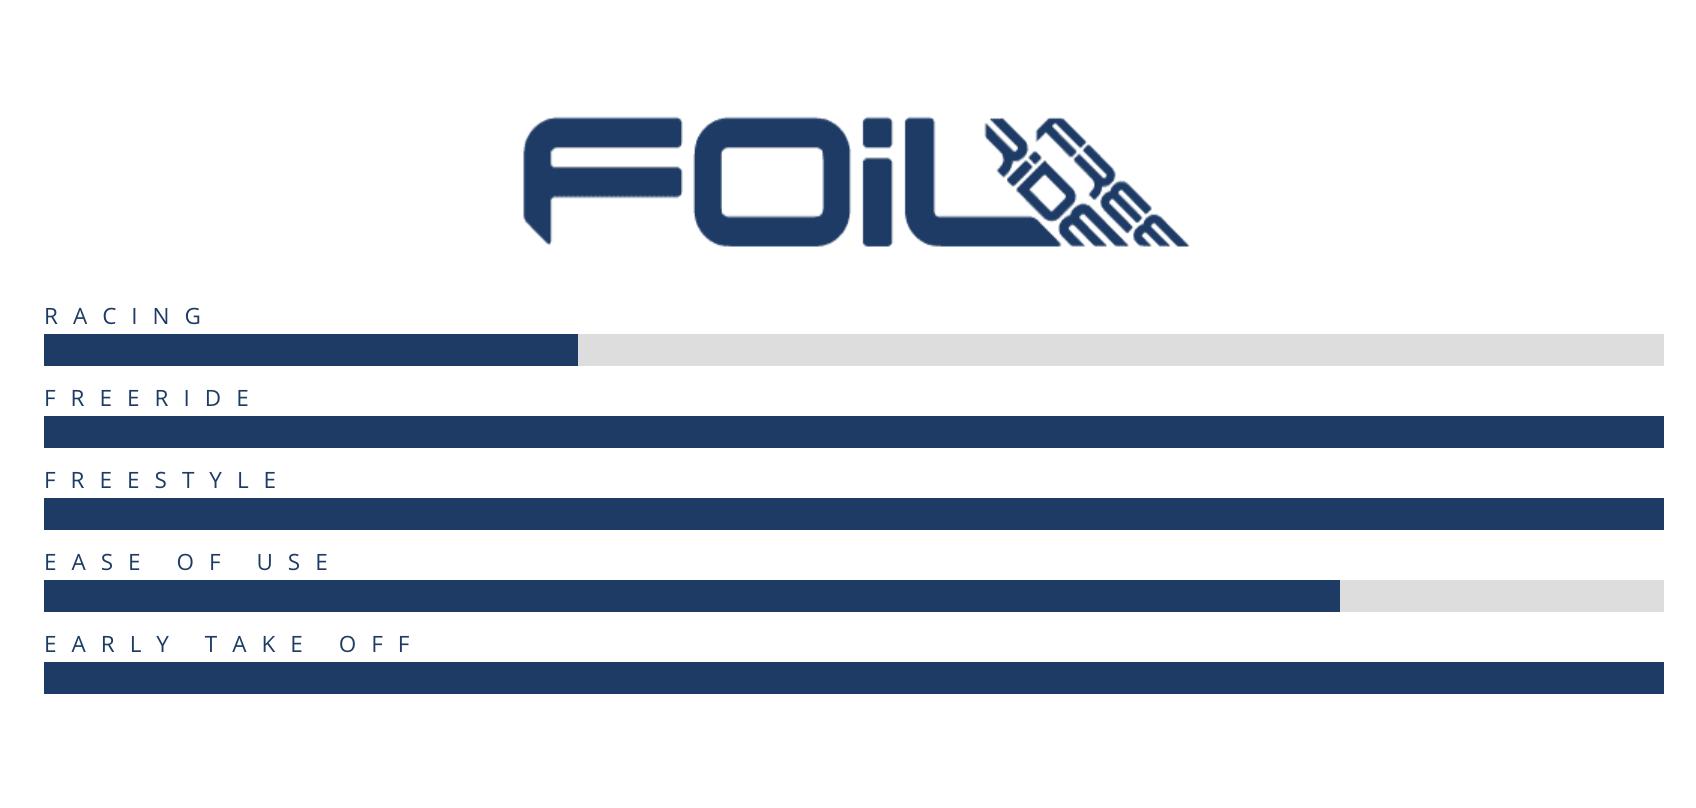 Starboard Foil Freeride Flax Balsa 2021